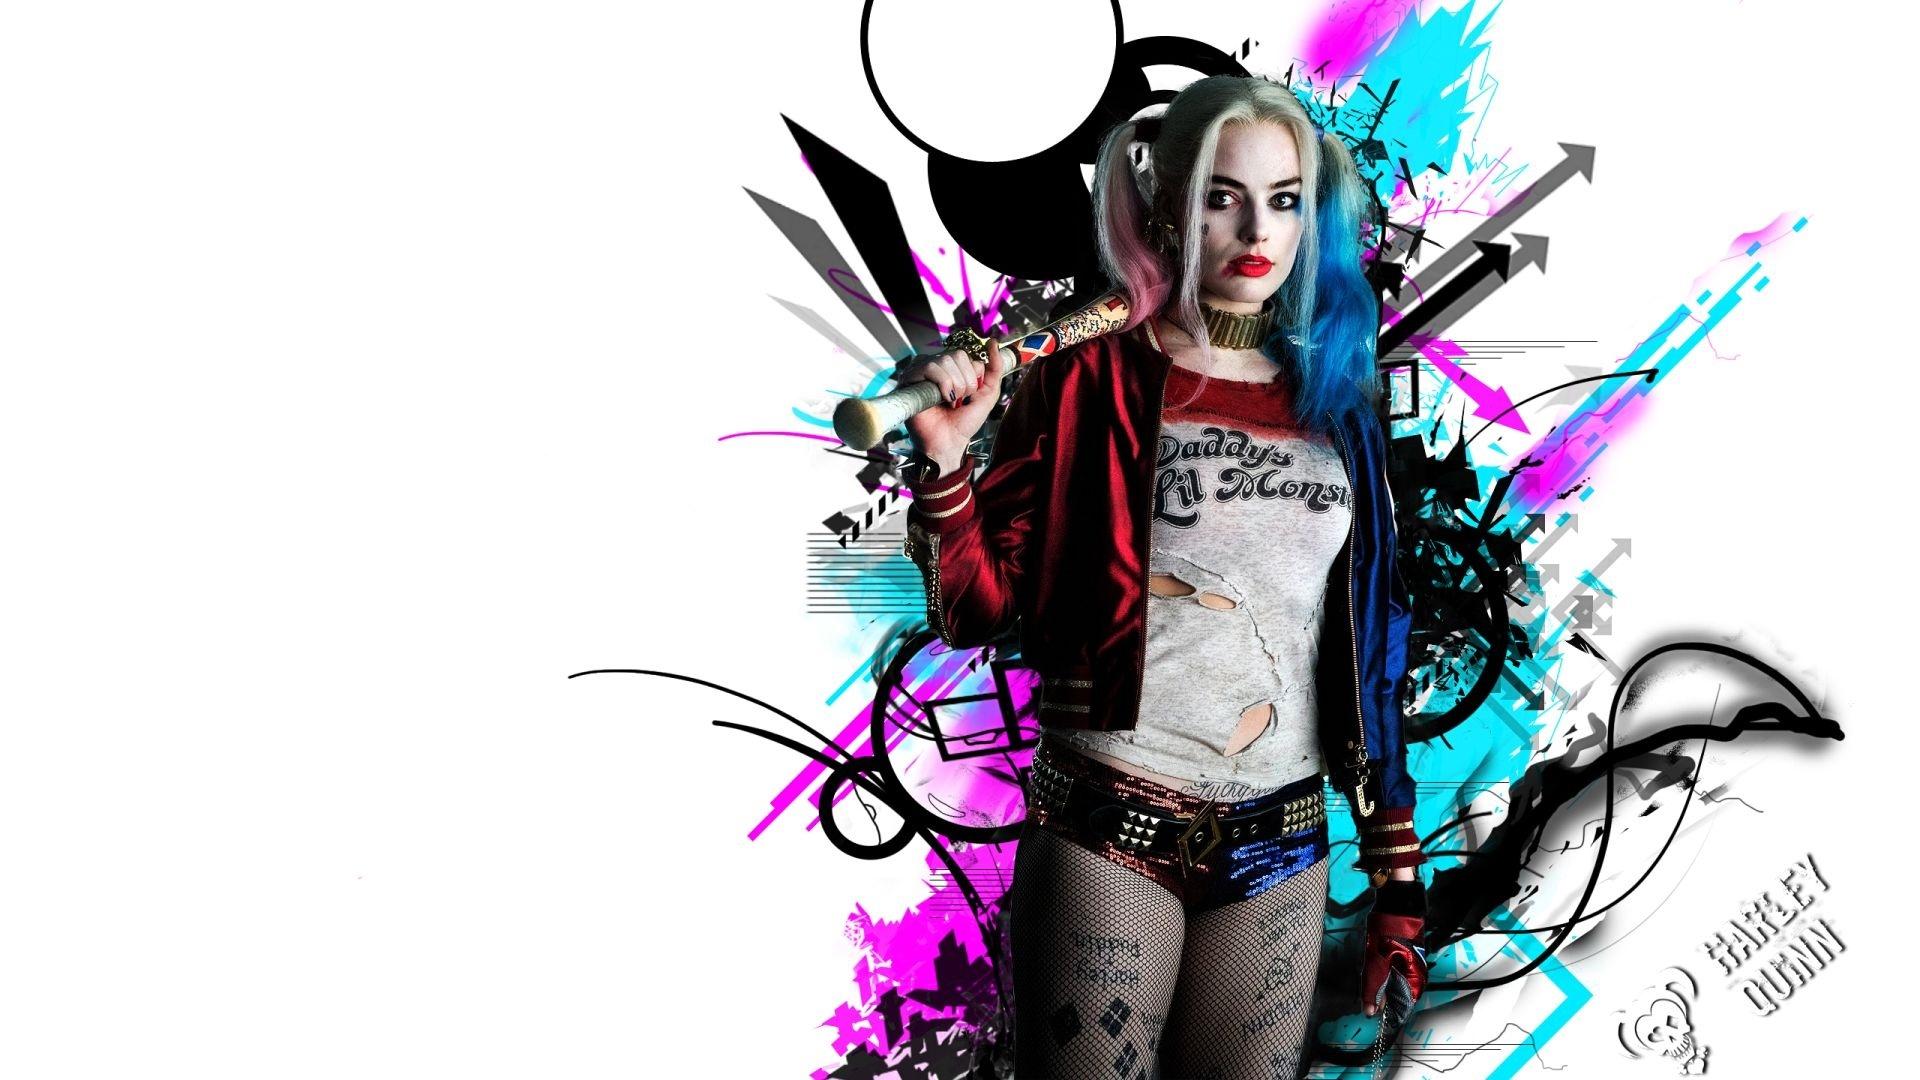 Harley Quinn background wallpaper